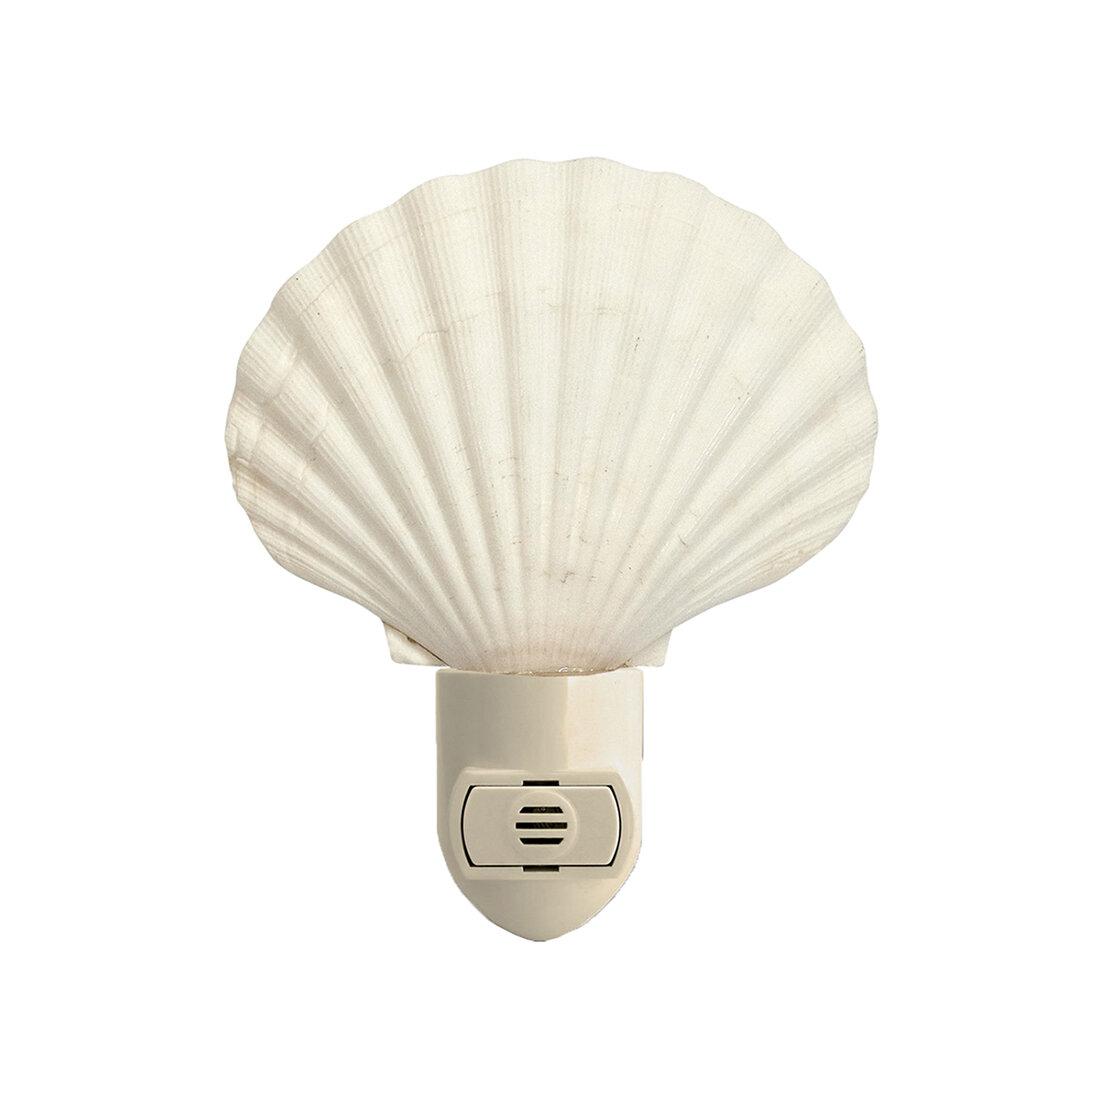 The Seashell Company Night Lights You Ll Love In 2021 Wayfair